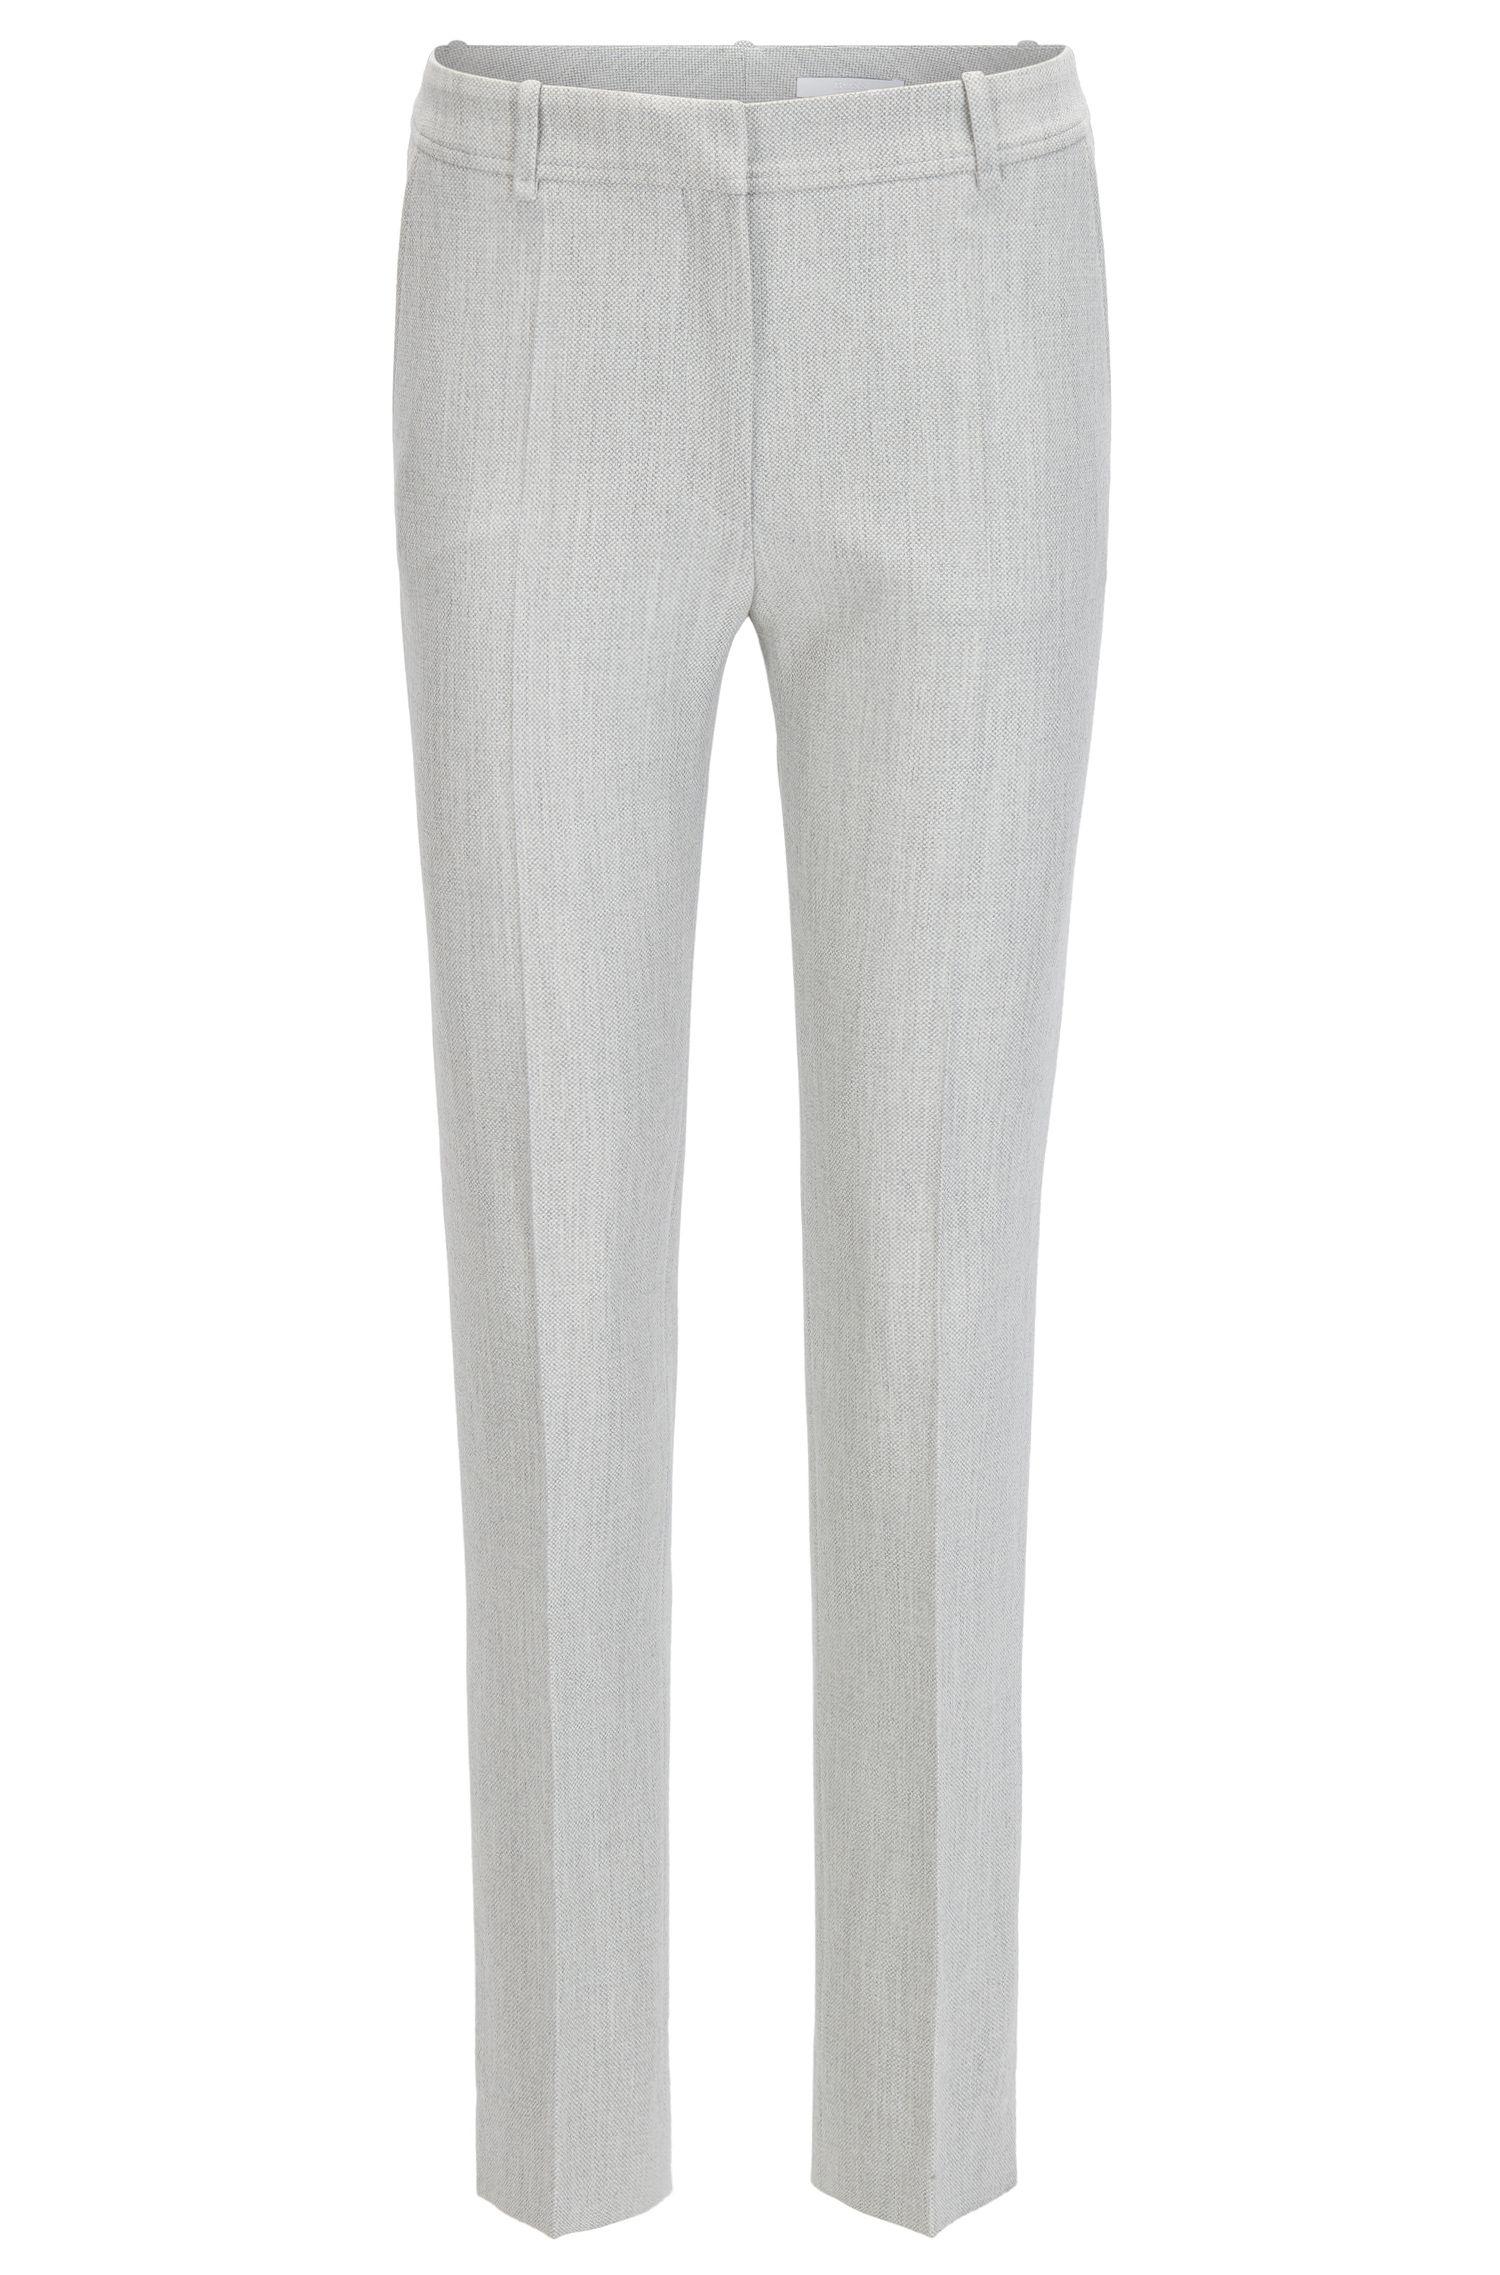 Regular-fit trousers in a stretch technical blend